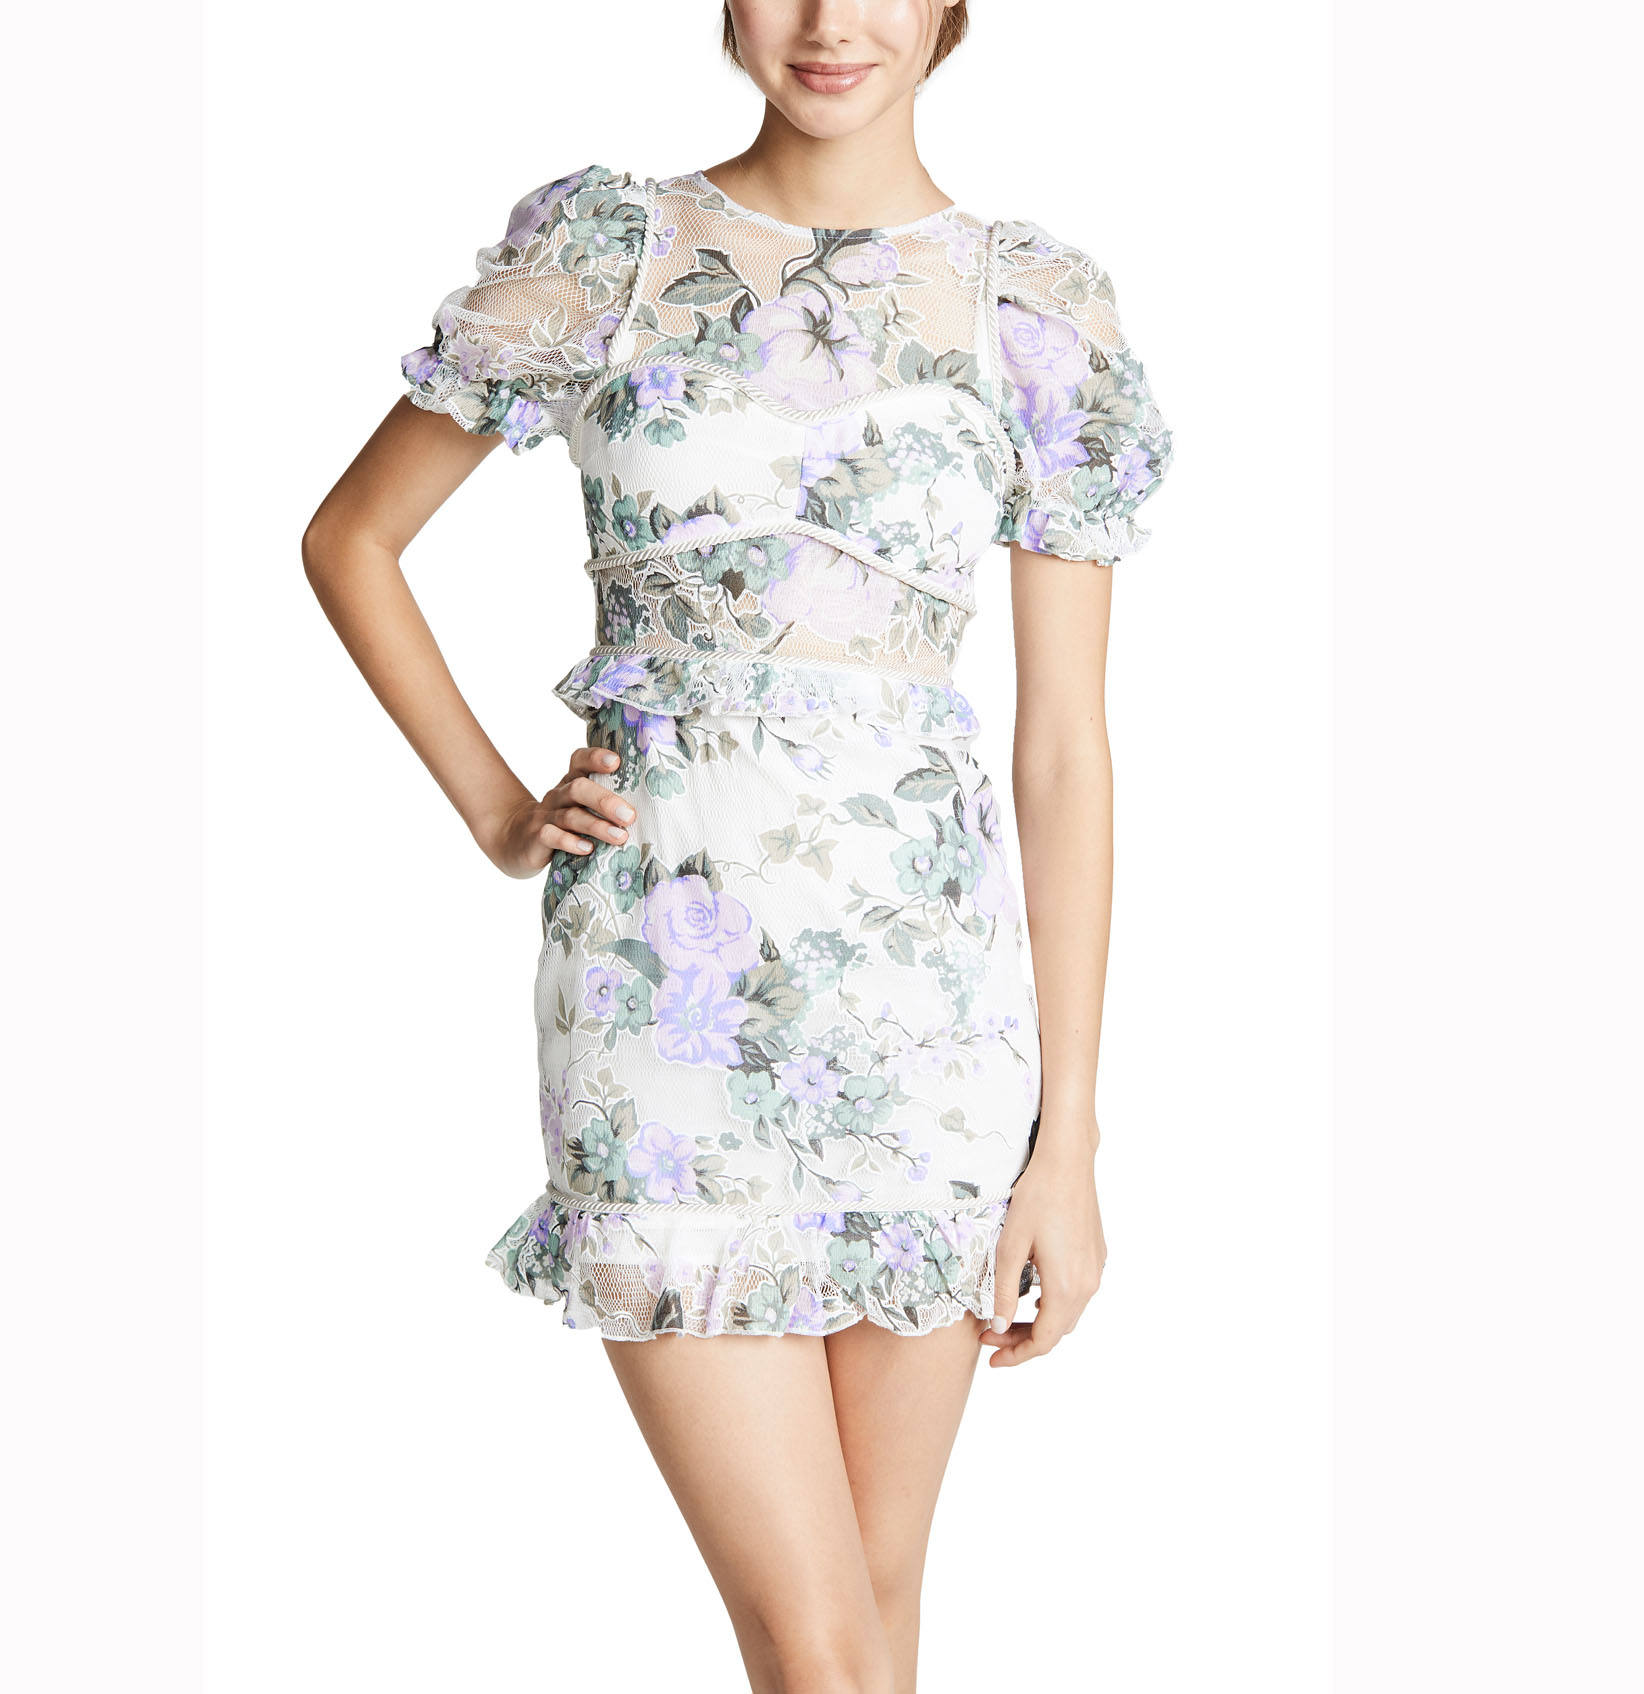 Mesh Knitting Short Puff Sleeve Floral Print Transparent Sweet Mini Women Dress OEM